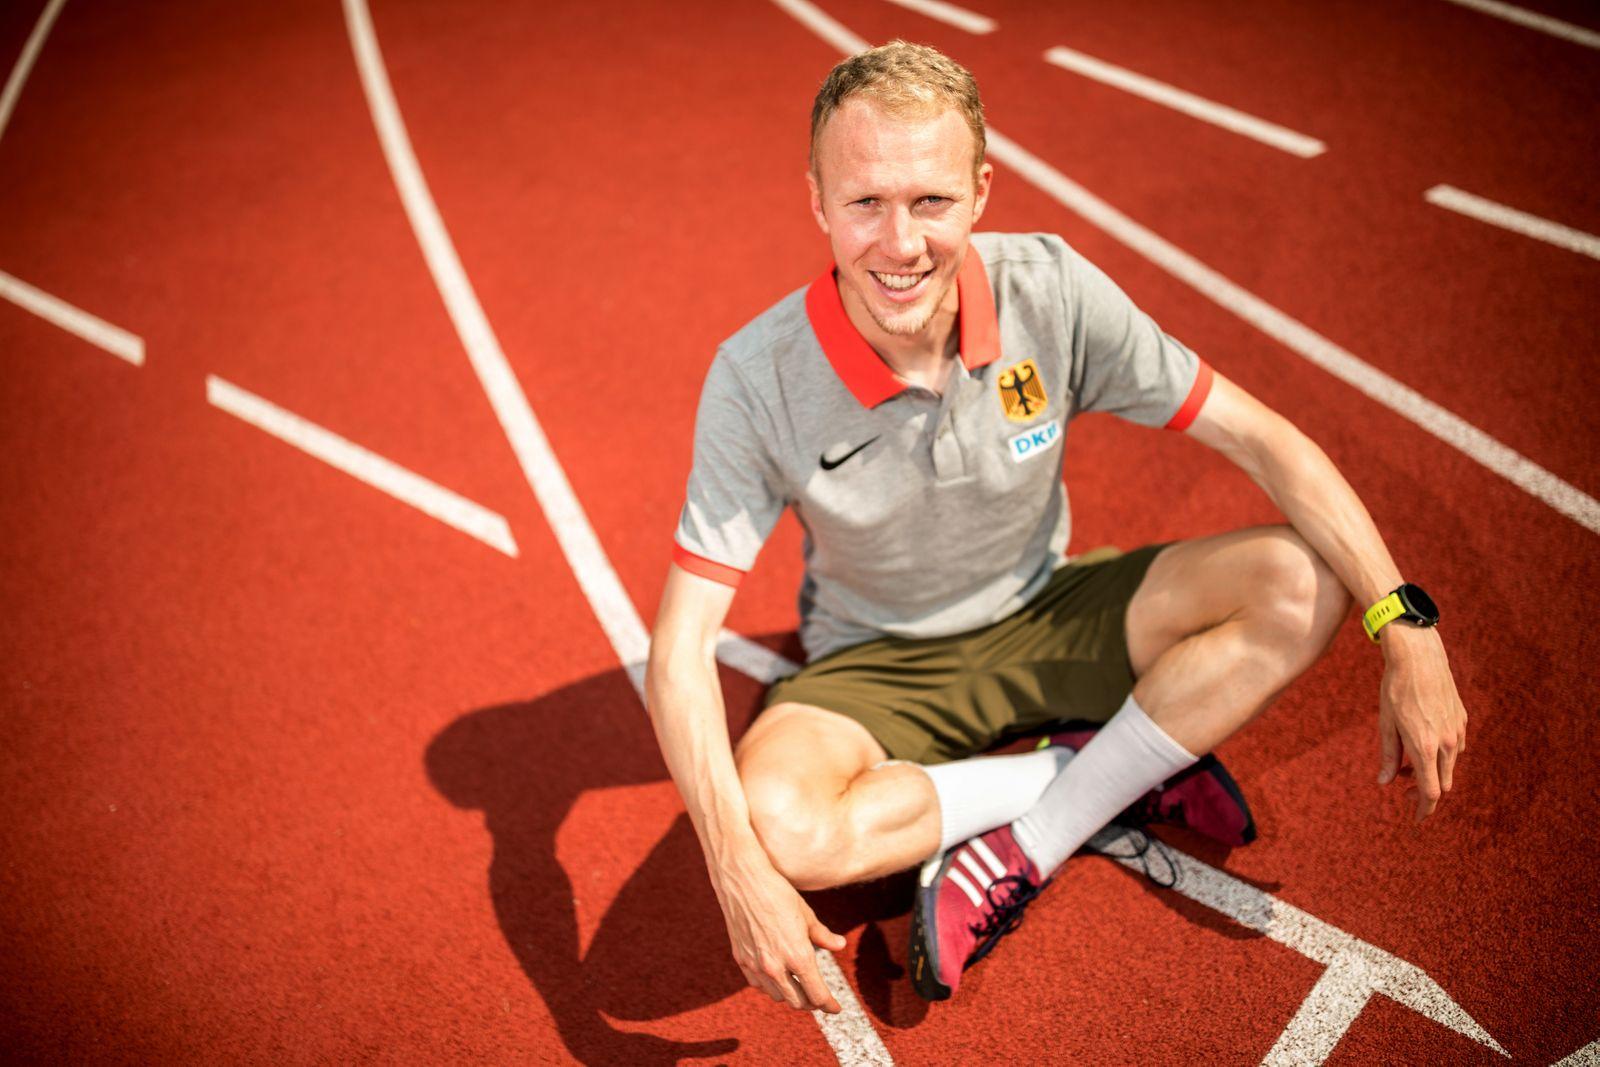 Leichtathletik-EM - Medientag DLV